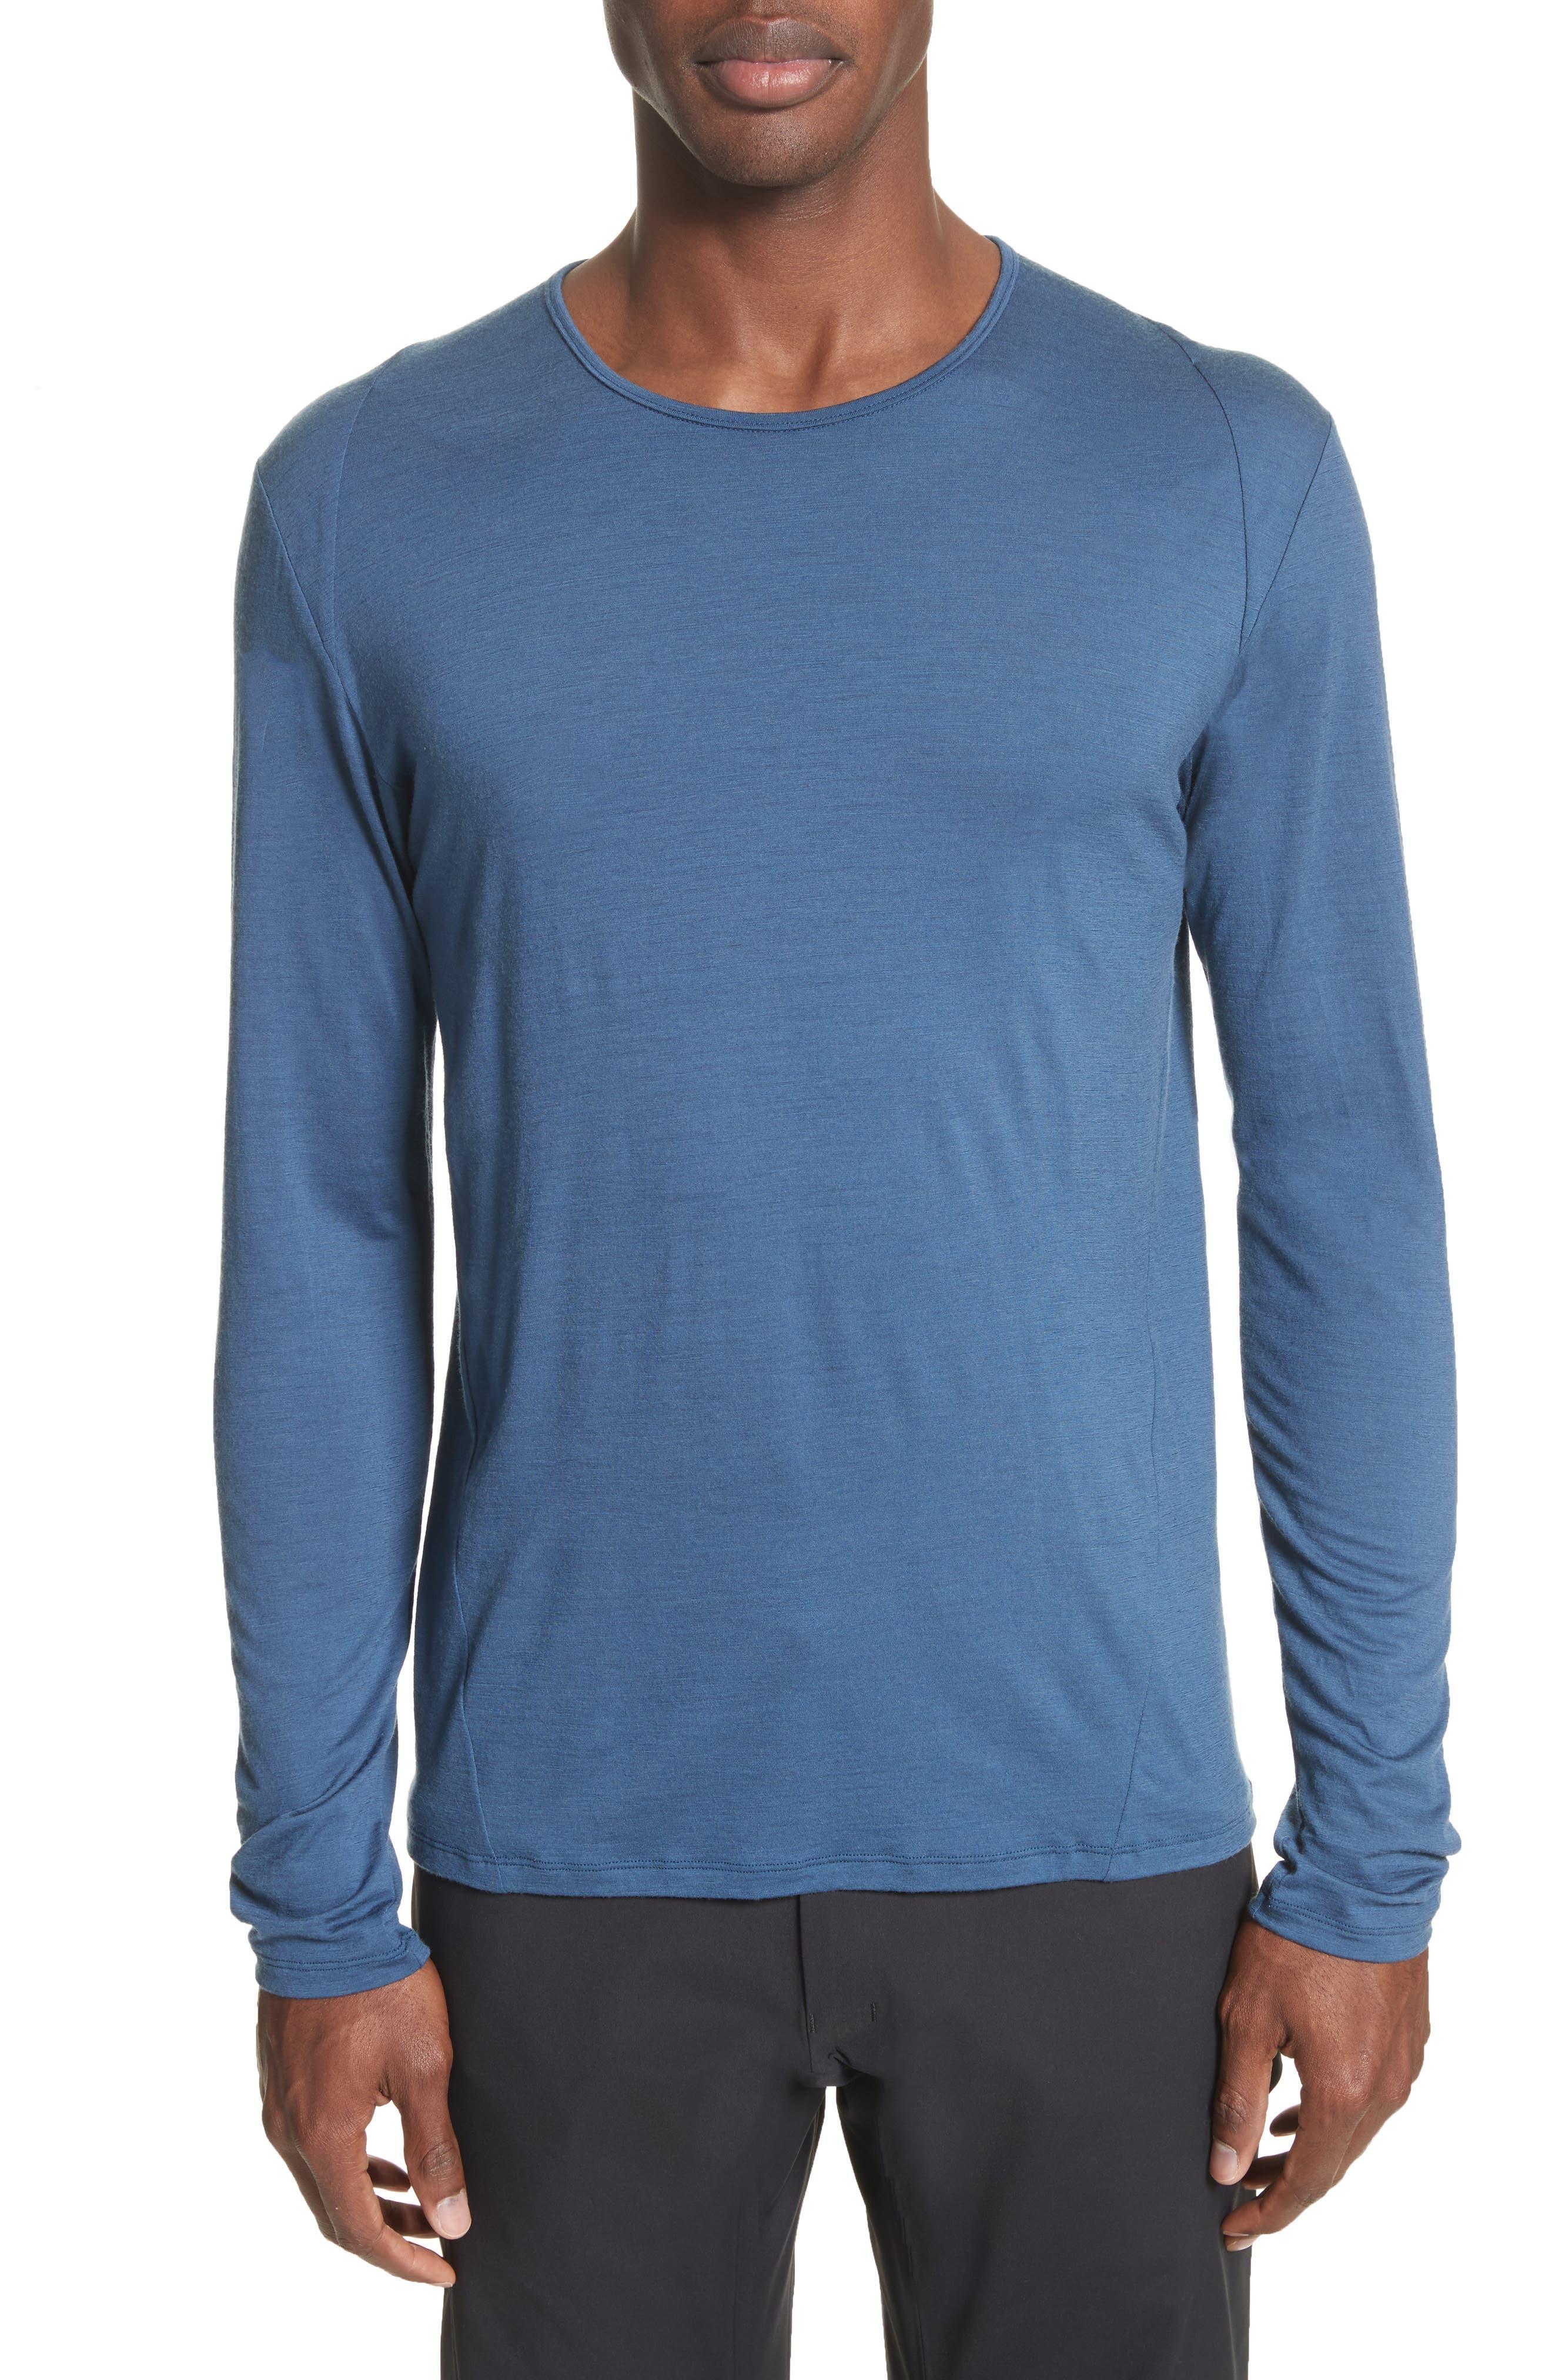 Frame Merino Wool T-Shirt,                         Main,                         color, Navy